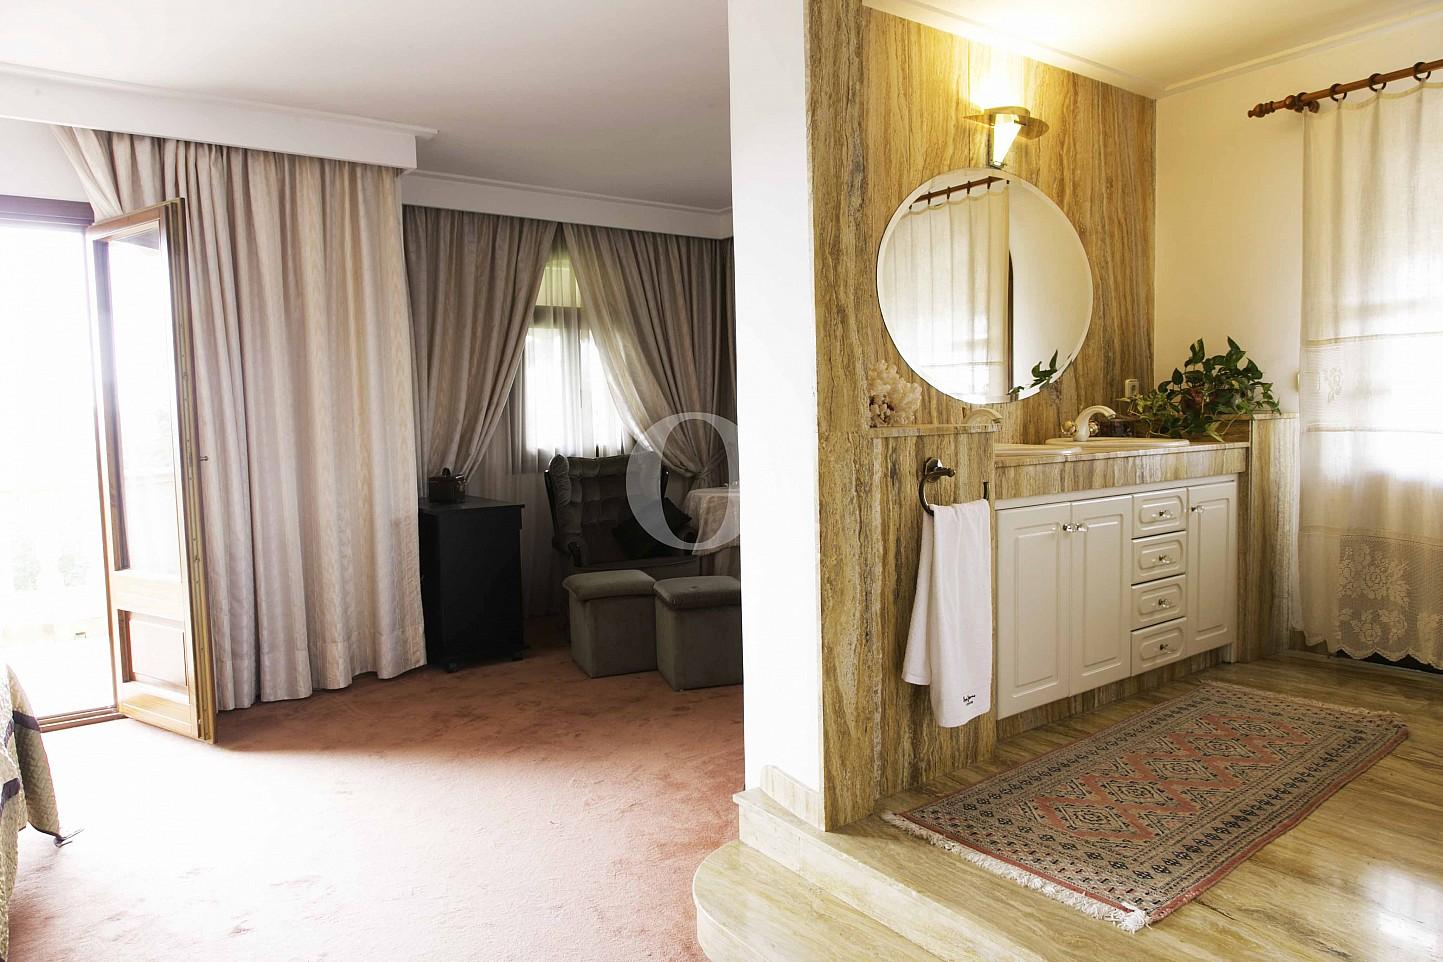 Vistas interiores de lujosa villa en venta en San Lorenzo, Mallorca